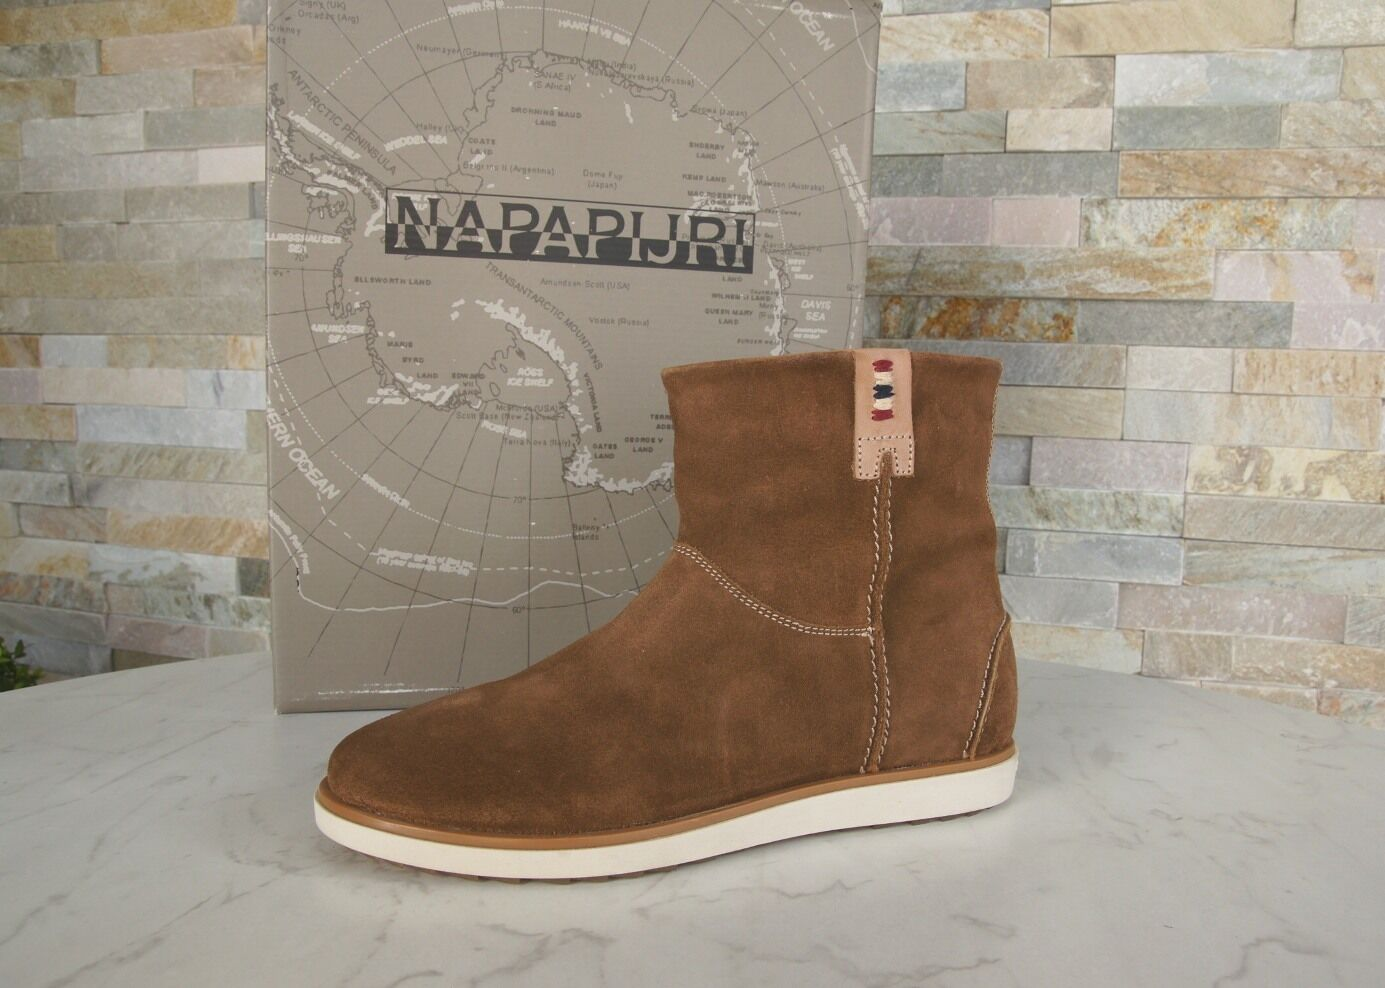 Shoes Bottes Bottines 36 T Napapijri Chaussures RvnqzBBg